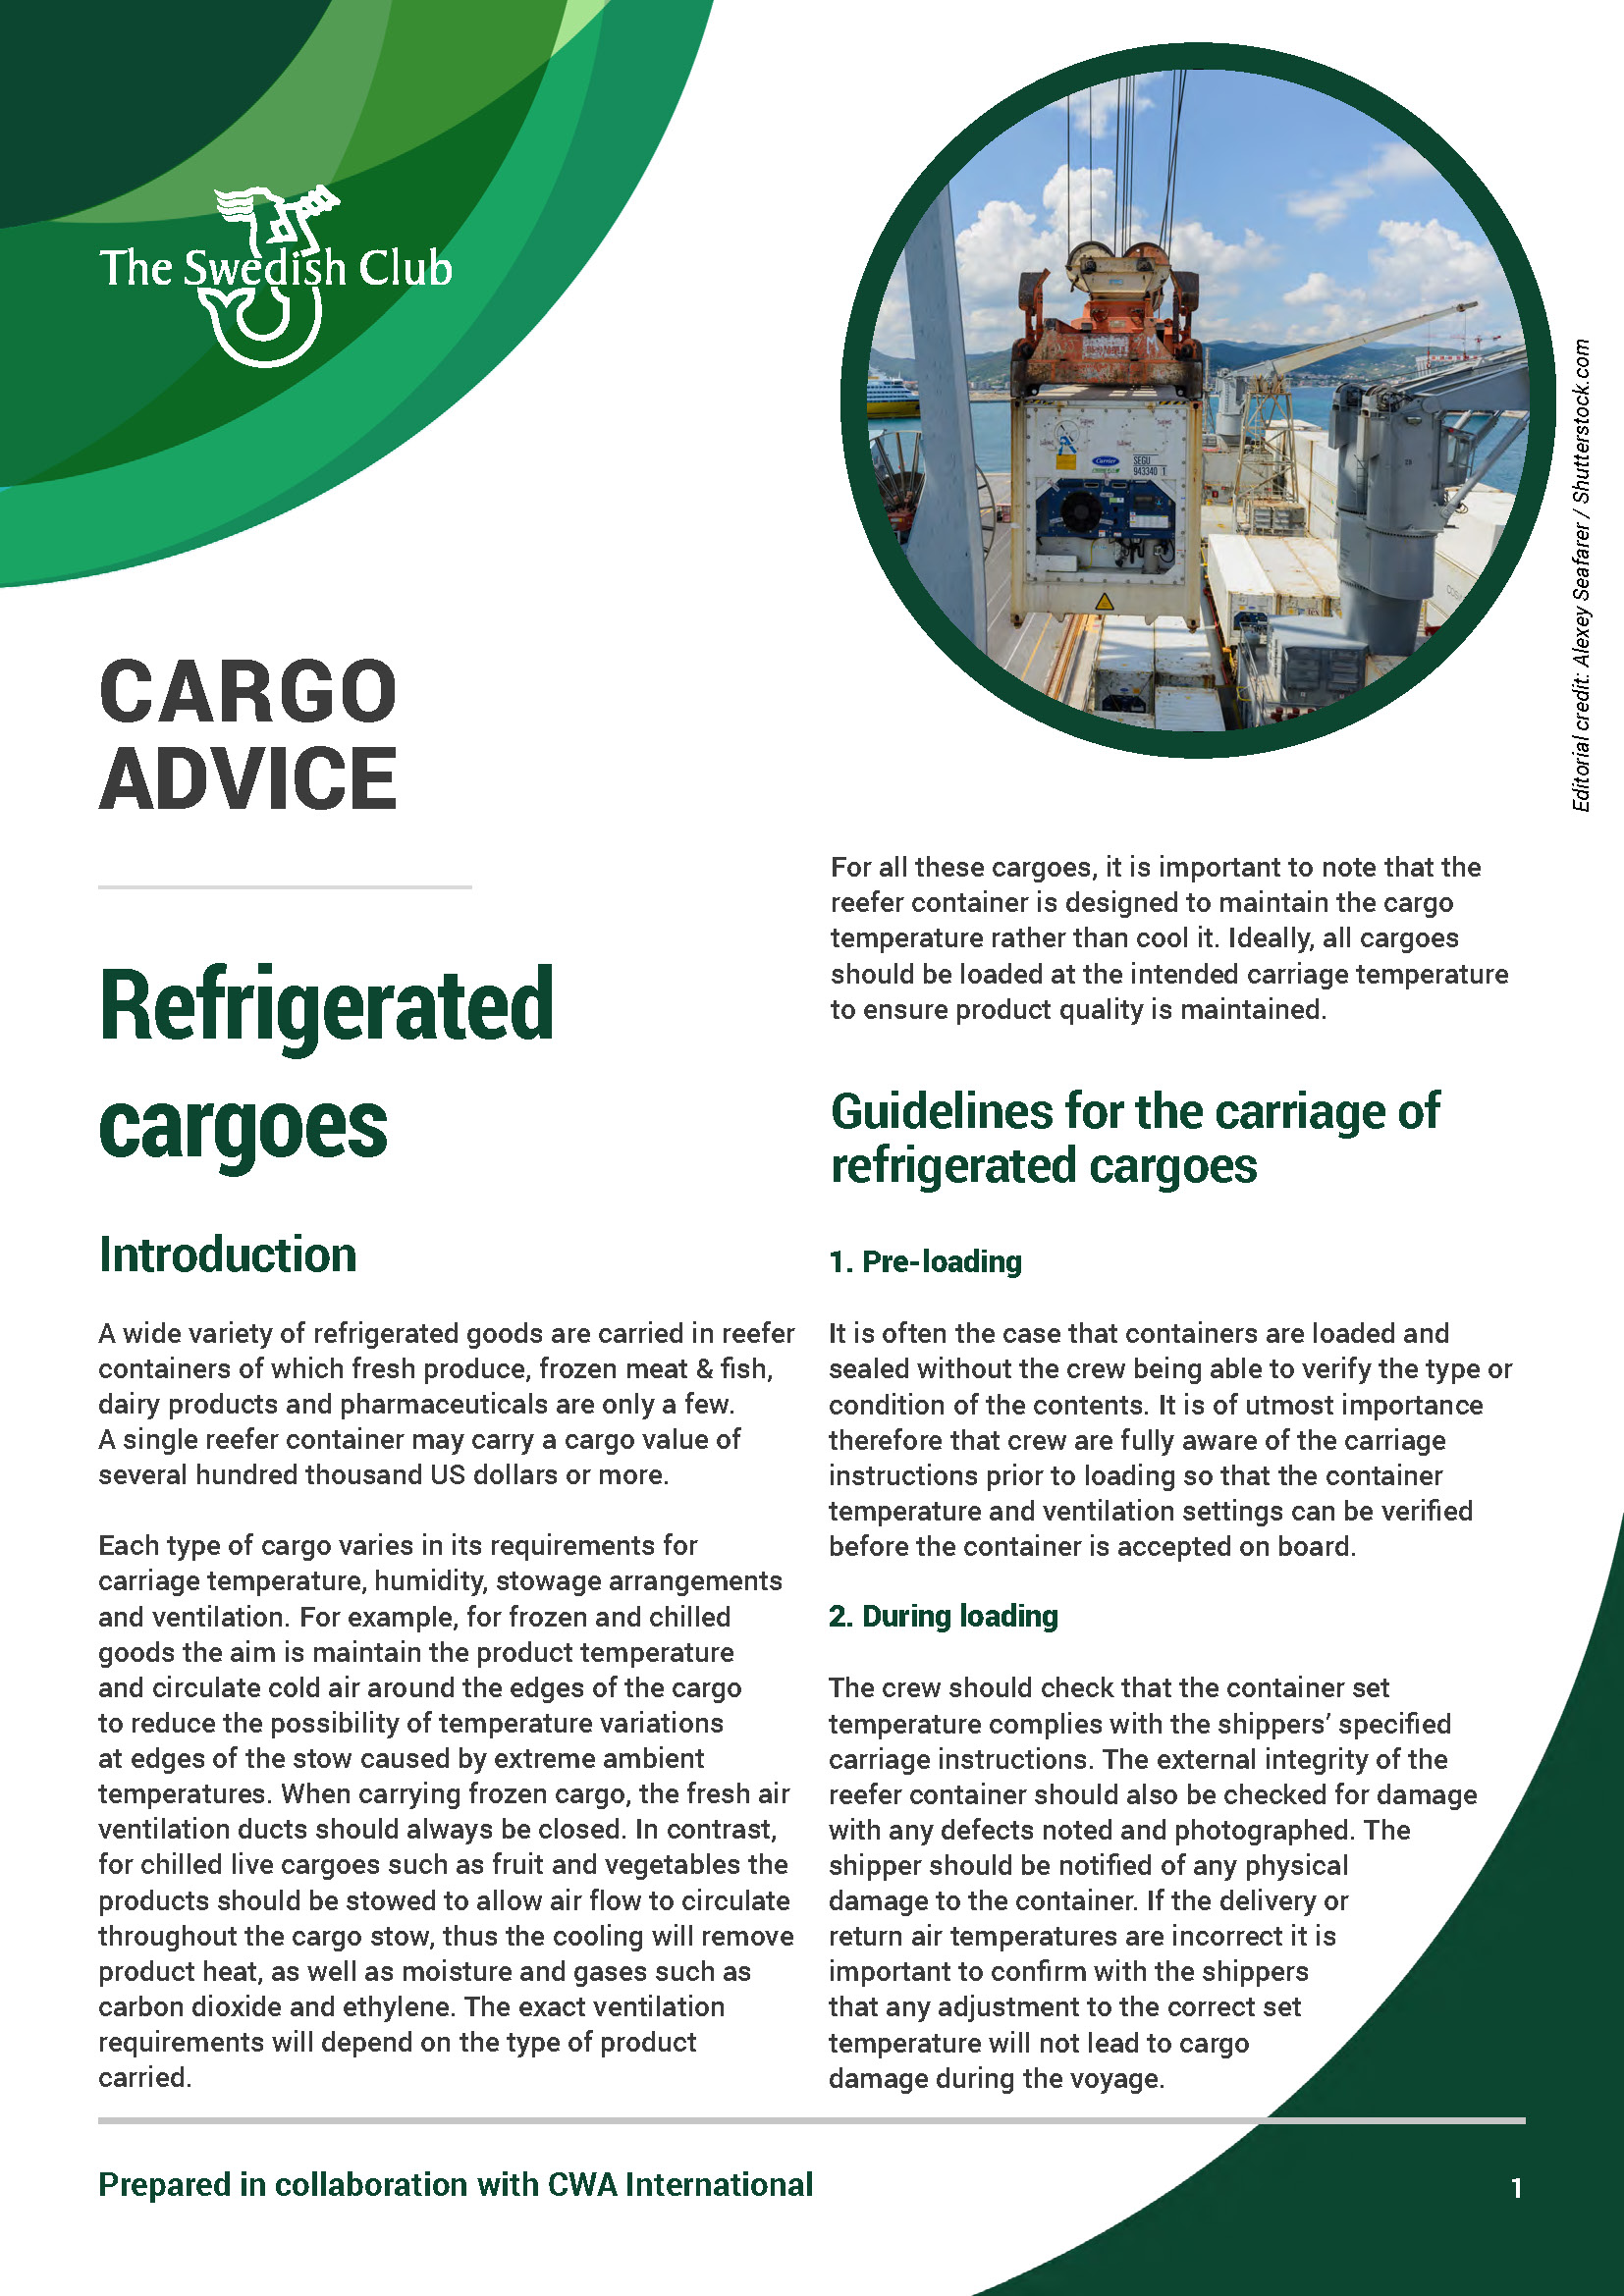 Cargo advice refrigerated cargoes